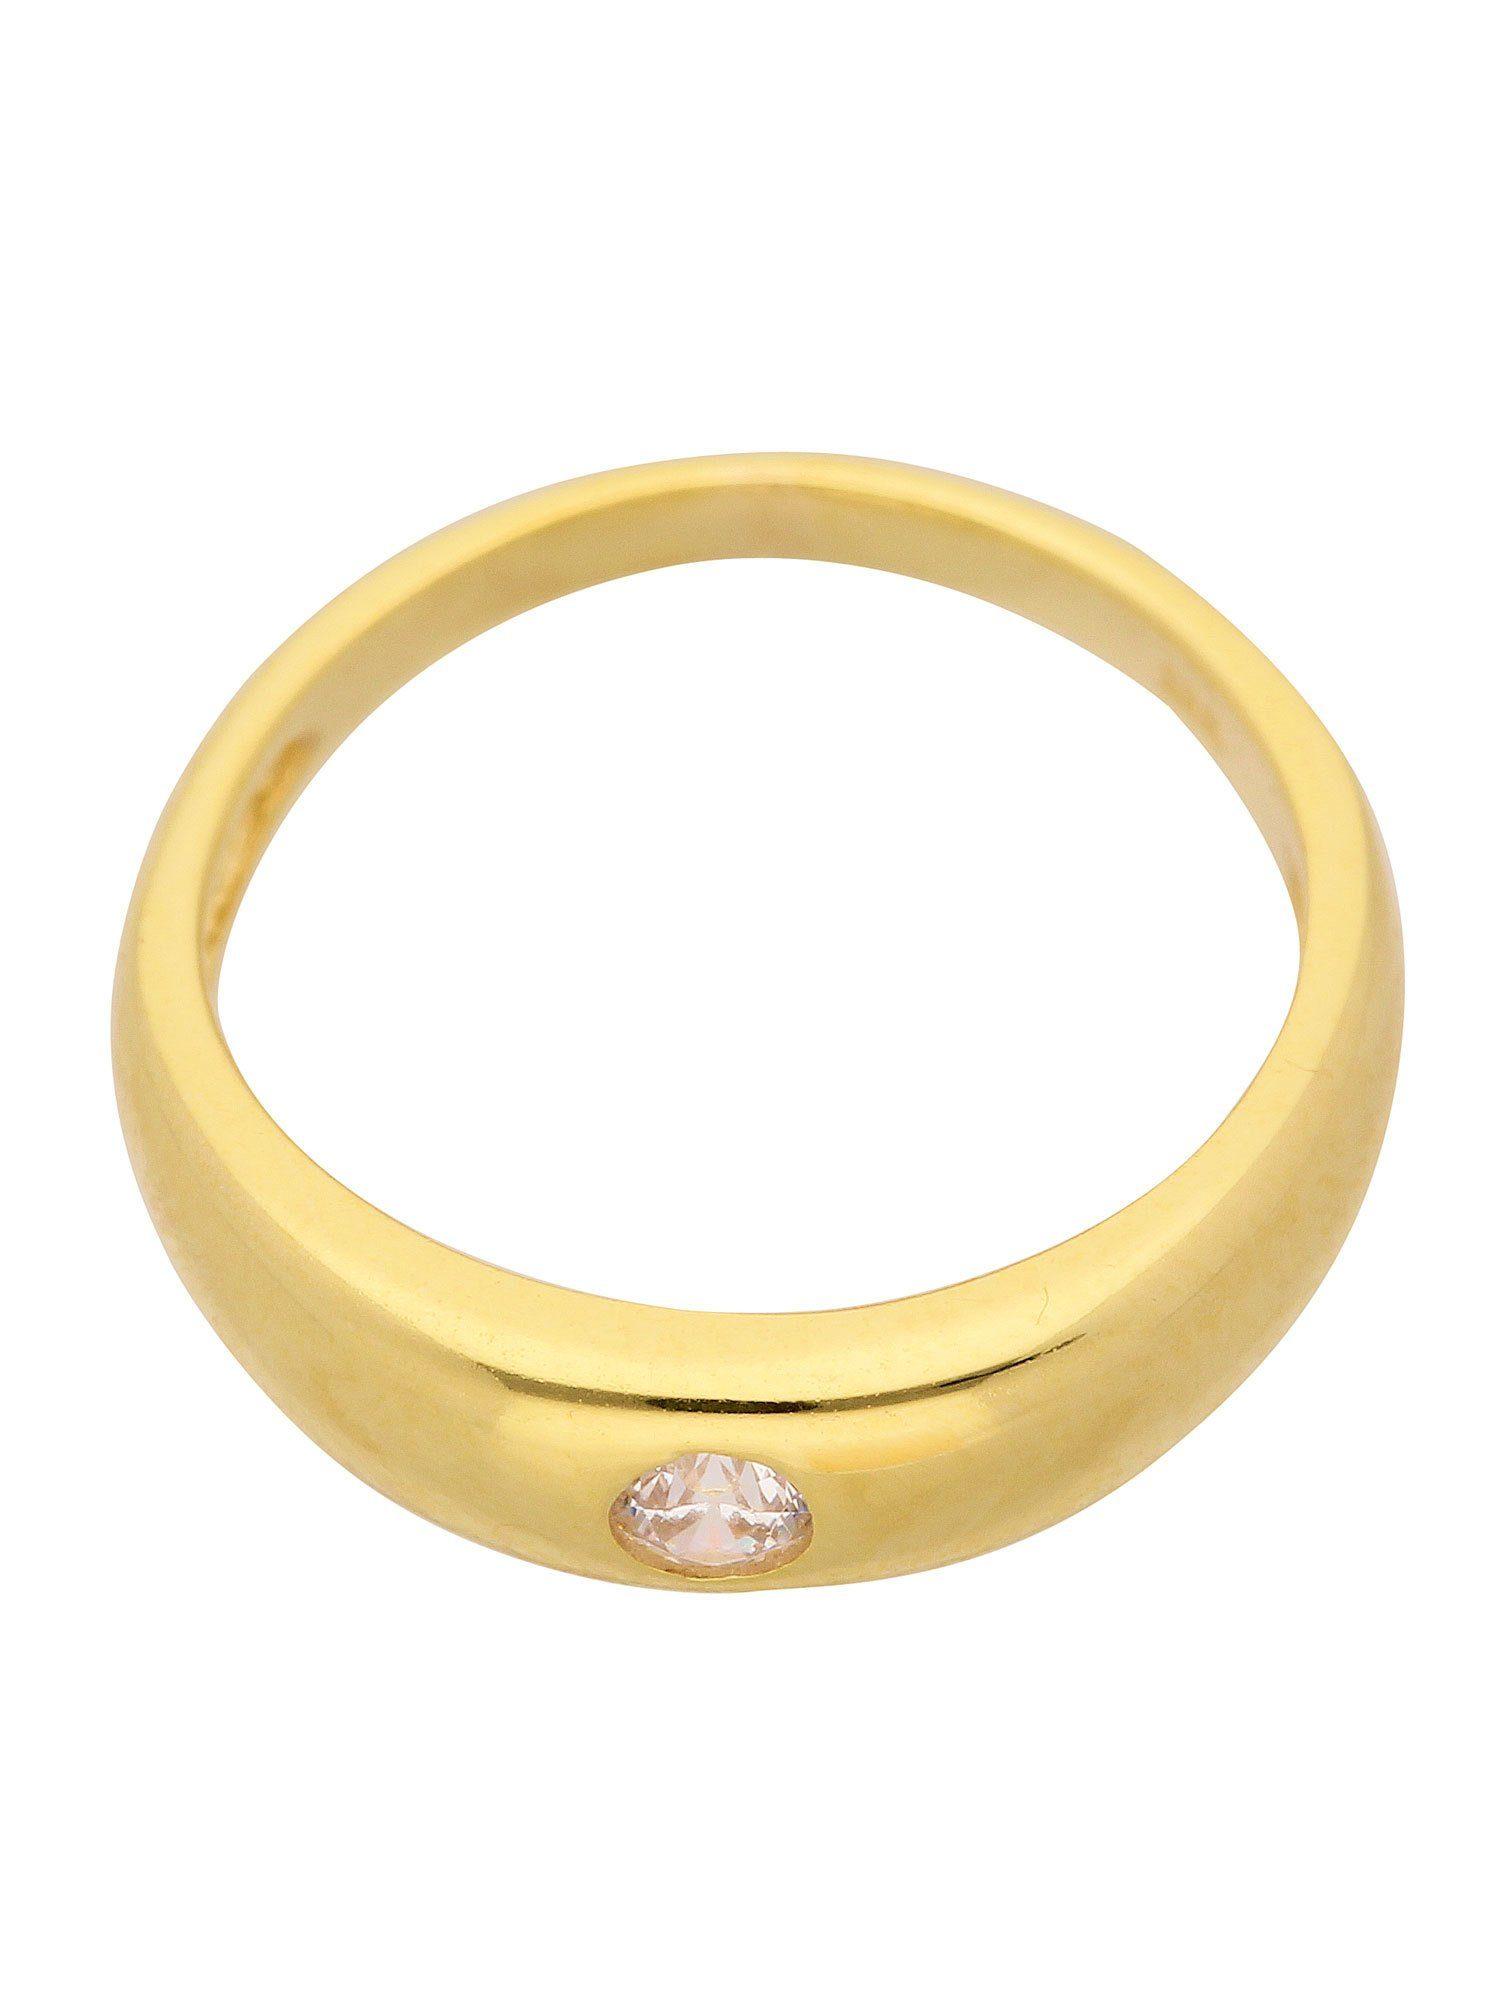 Adelia´s Kettenanhänger »Gold 14 k (585) Motiv - Anhänger« Taufring 14 k 585 Gelbgold mit Zirkonia Ø 1.12 cm